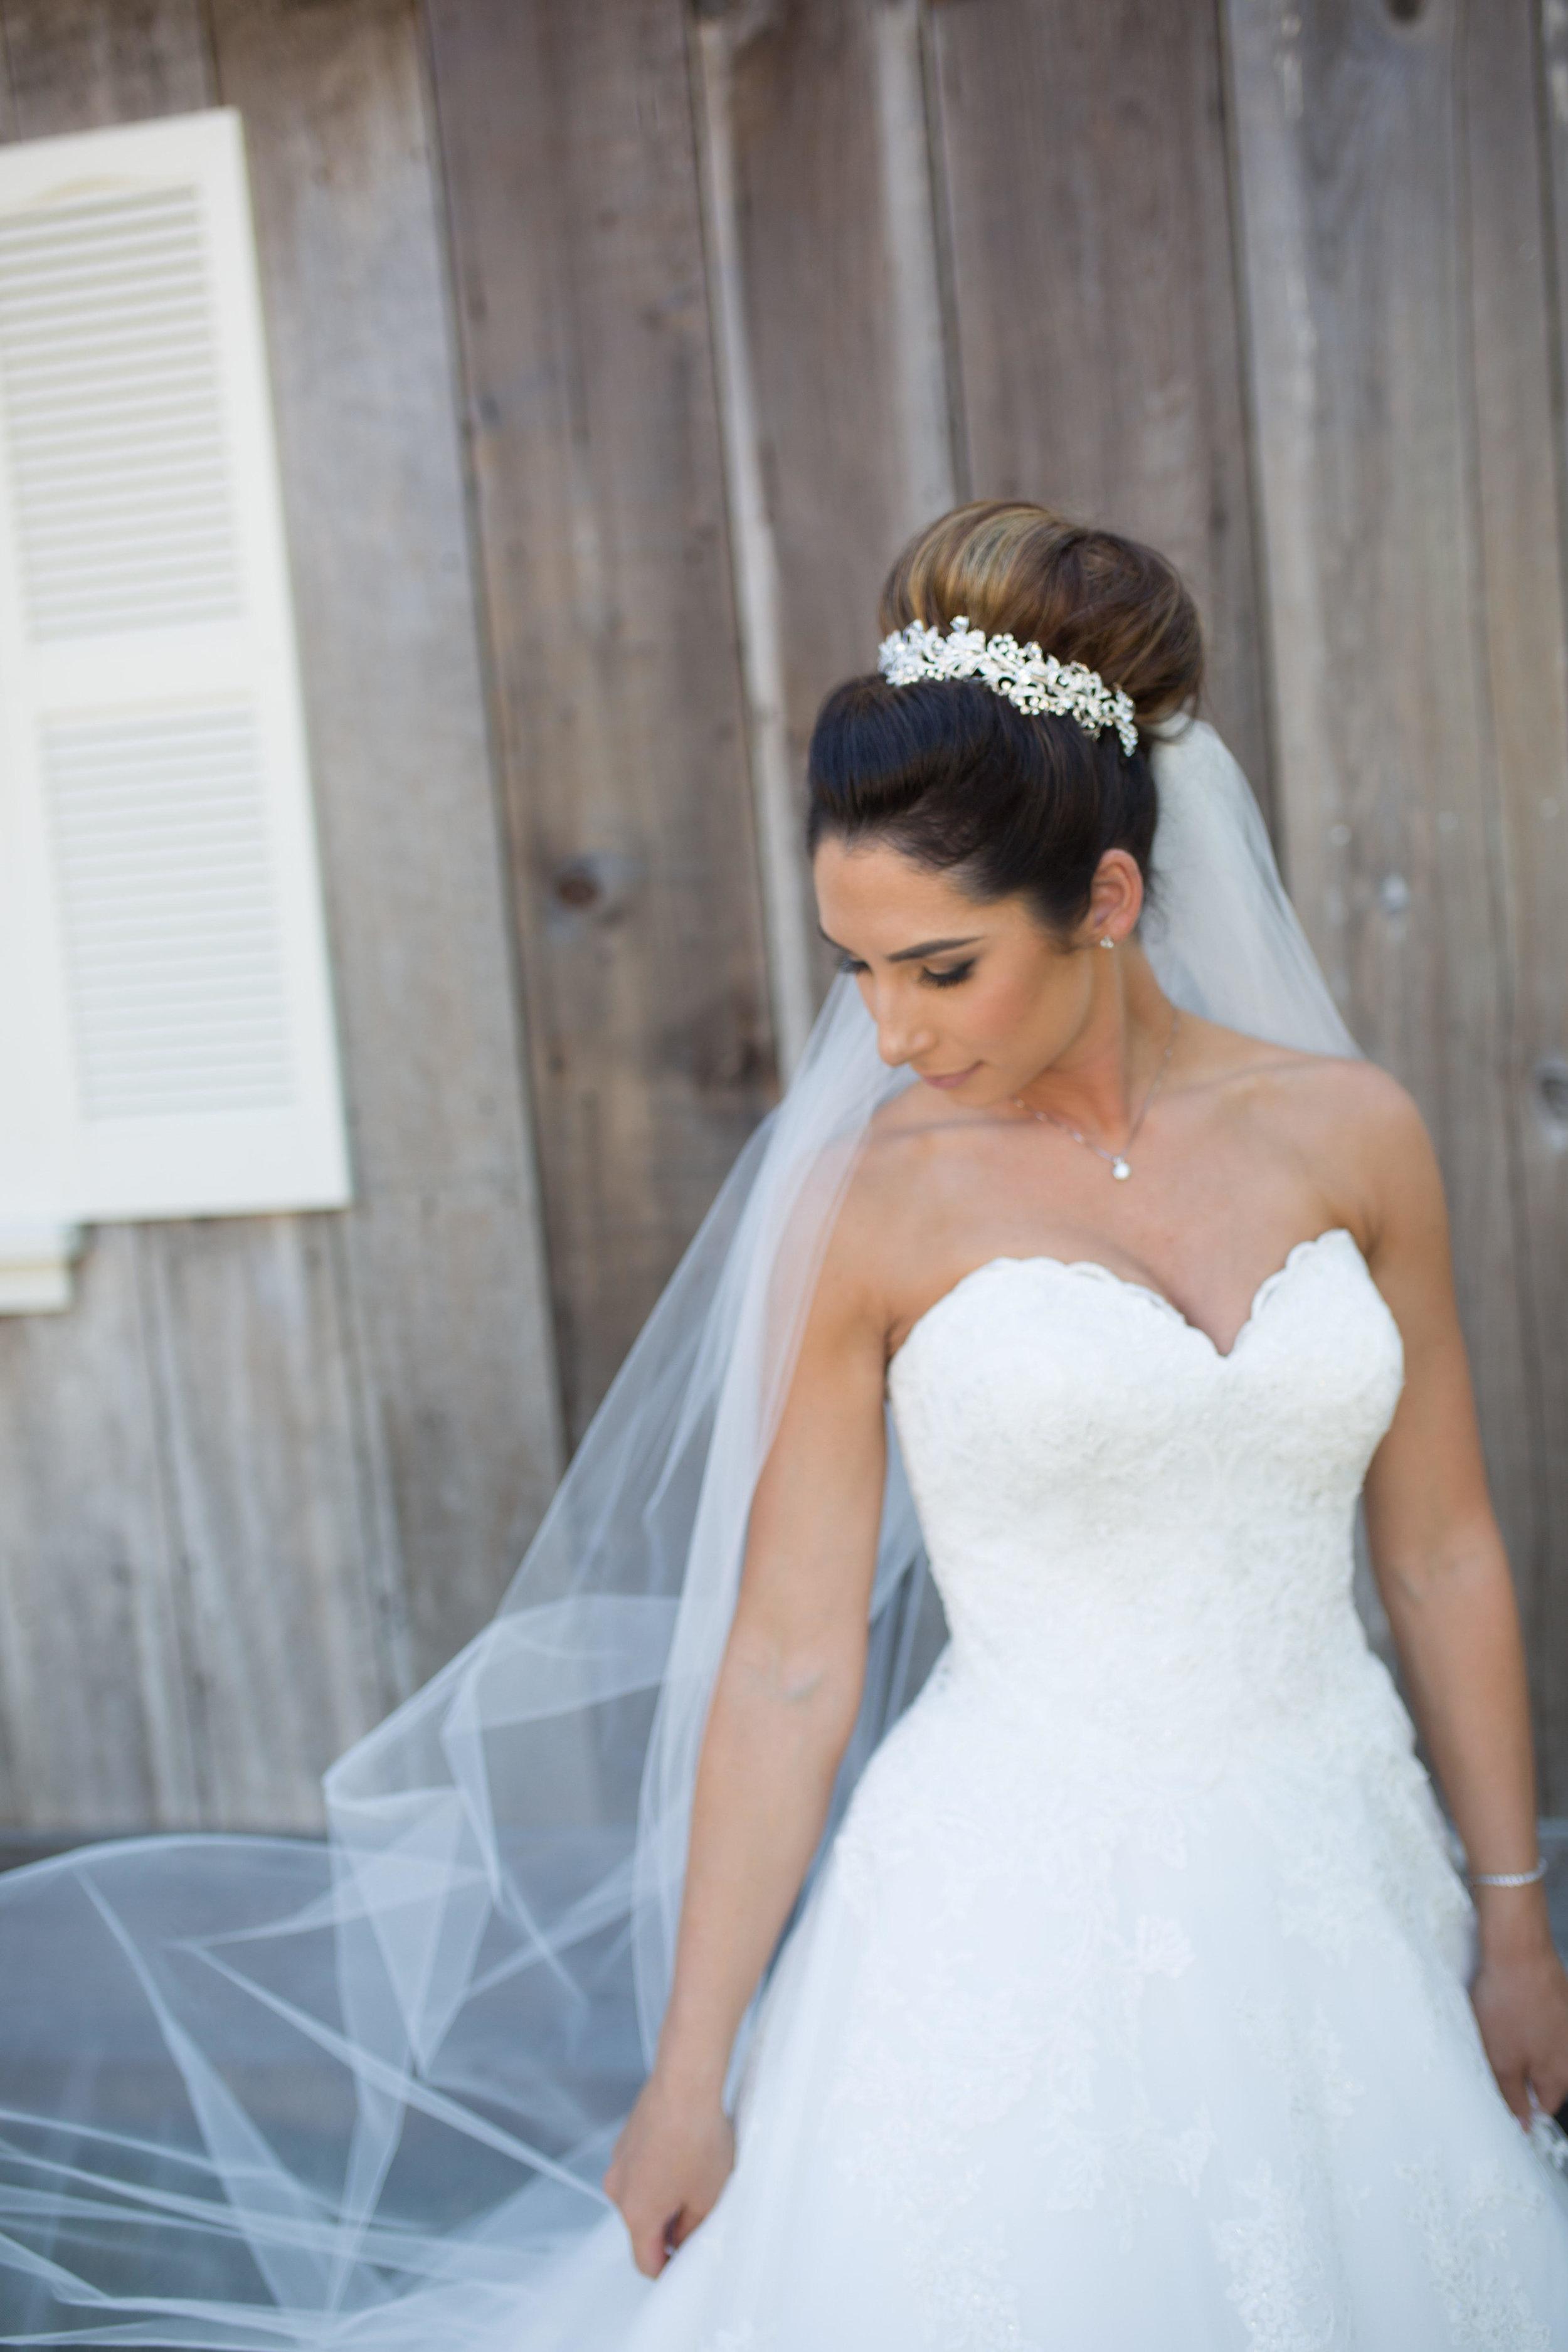 Ritual - wedding photos sent by kim - 3.jpg